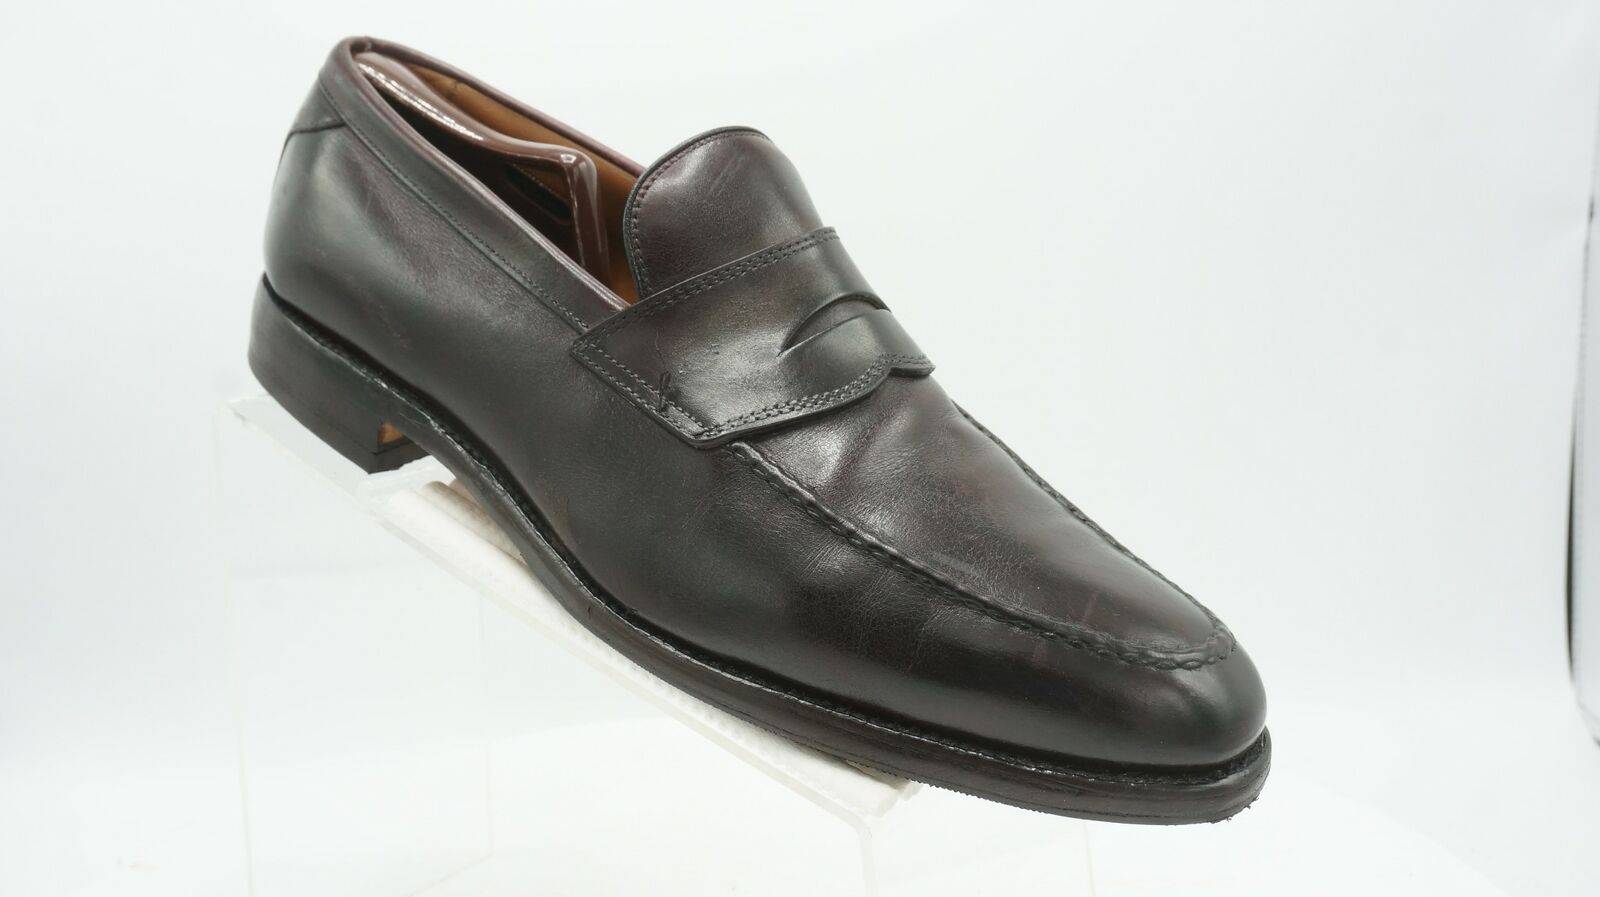 Allen Edmonds Hinsdale Sz 13 C Cordovan Leather Slip On Penny Loafers Mens shoes